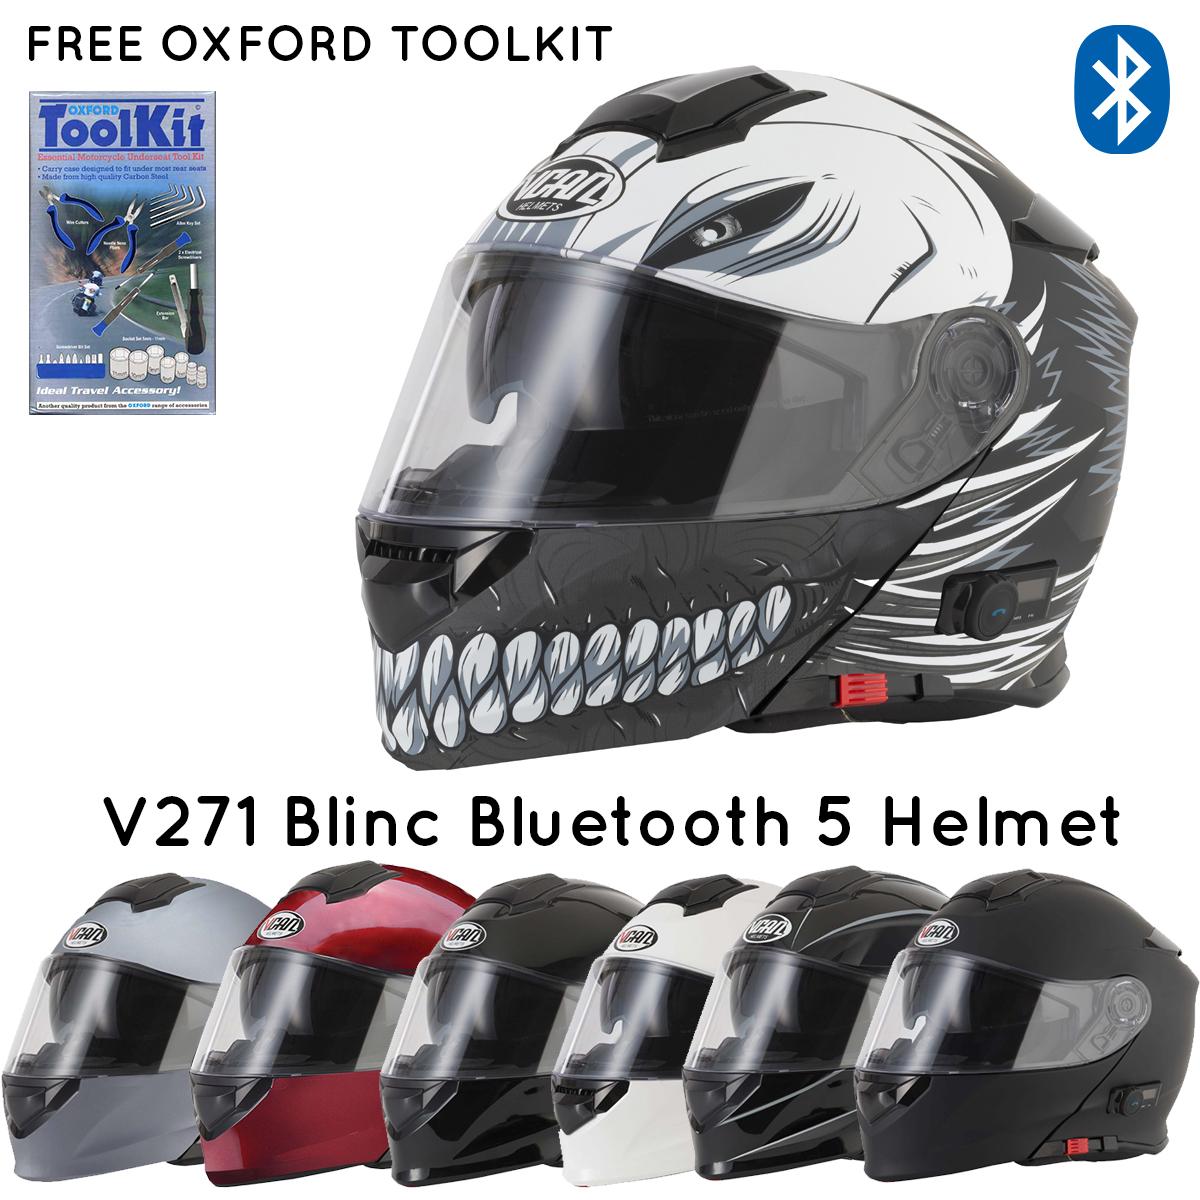 v271-1 Vcan V271 Blinc Bluetooth 5 Helmet- FREE OXFORD TOOL KIT